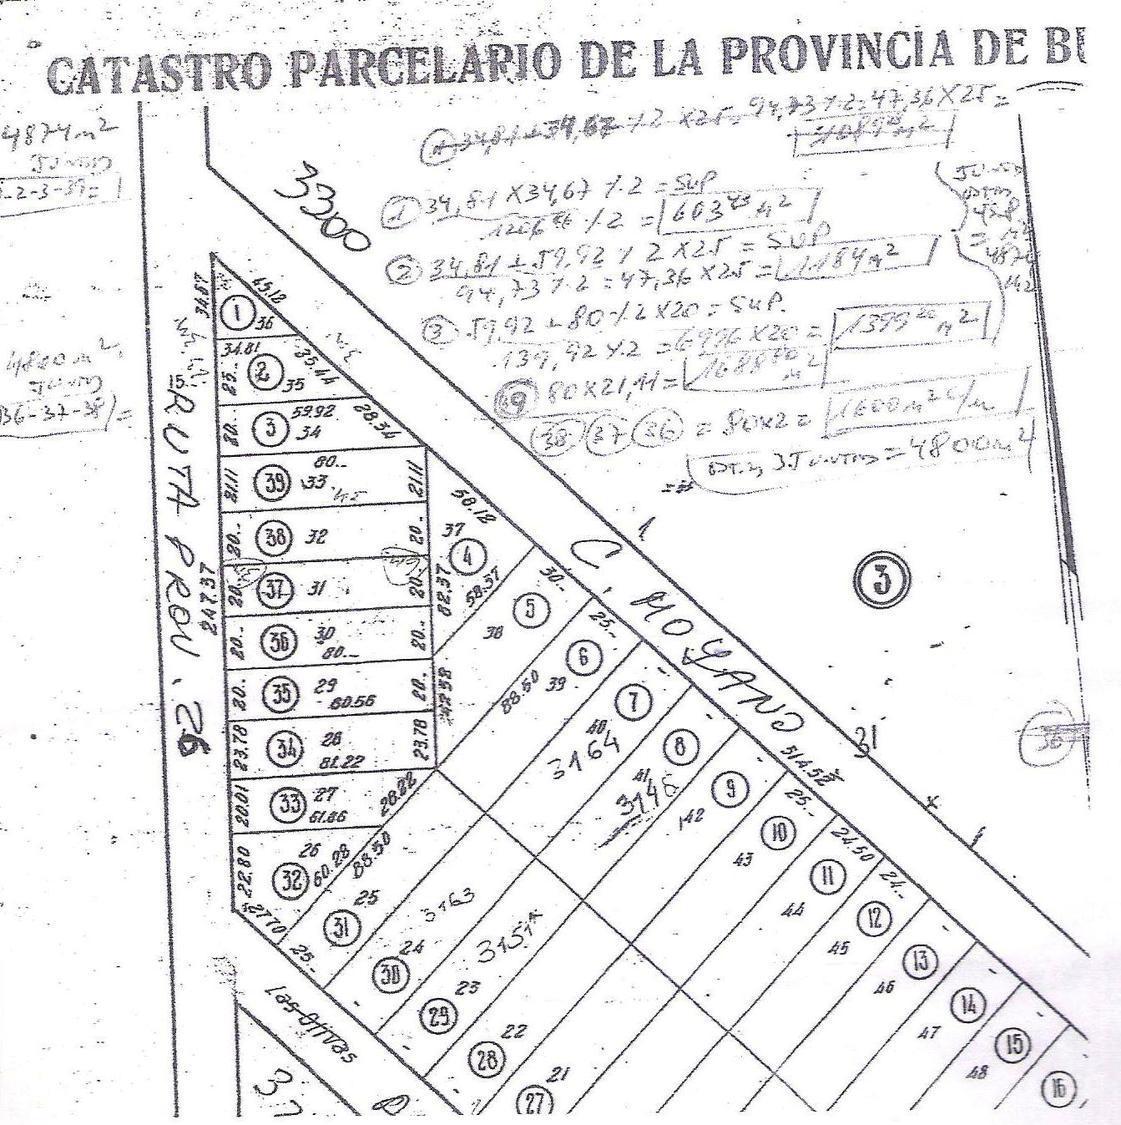 Terreno-Venta-Manuel Alberti-RUTA Nº 26 (AV. CONSTITUCION) Y MOYANO - 10.000 M2 RUTA 26 Y MOYANO - PILAR